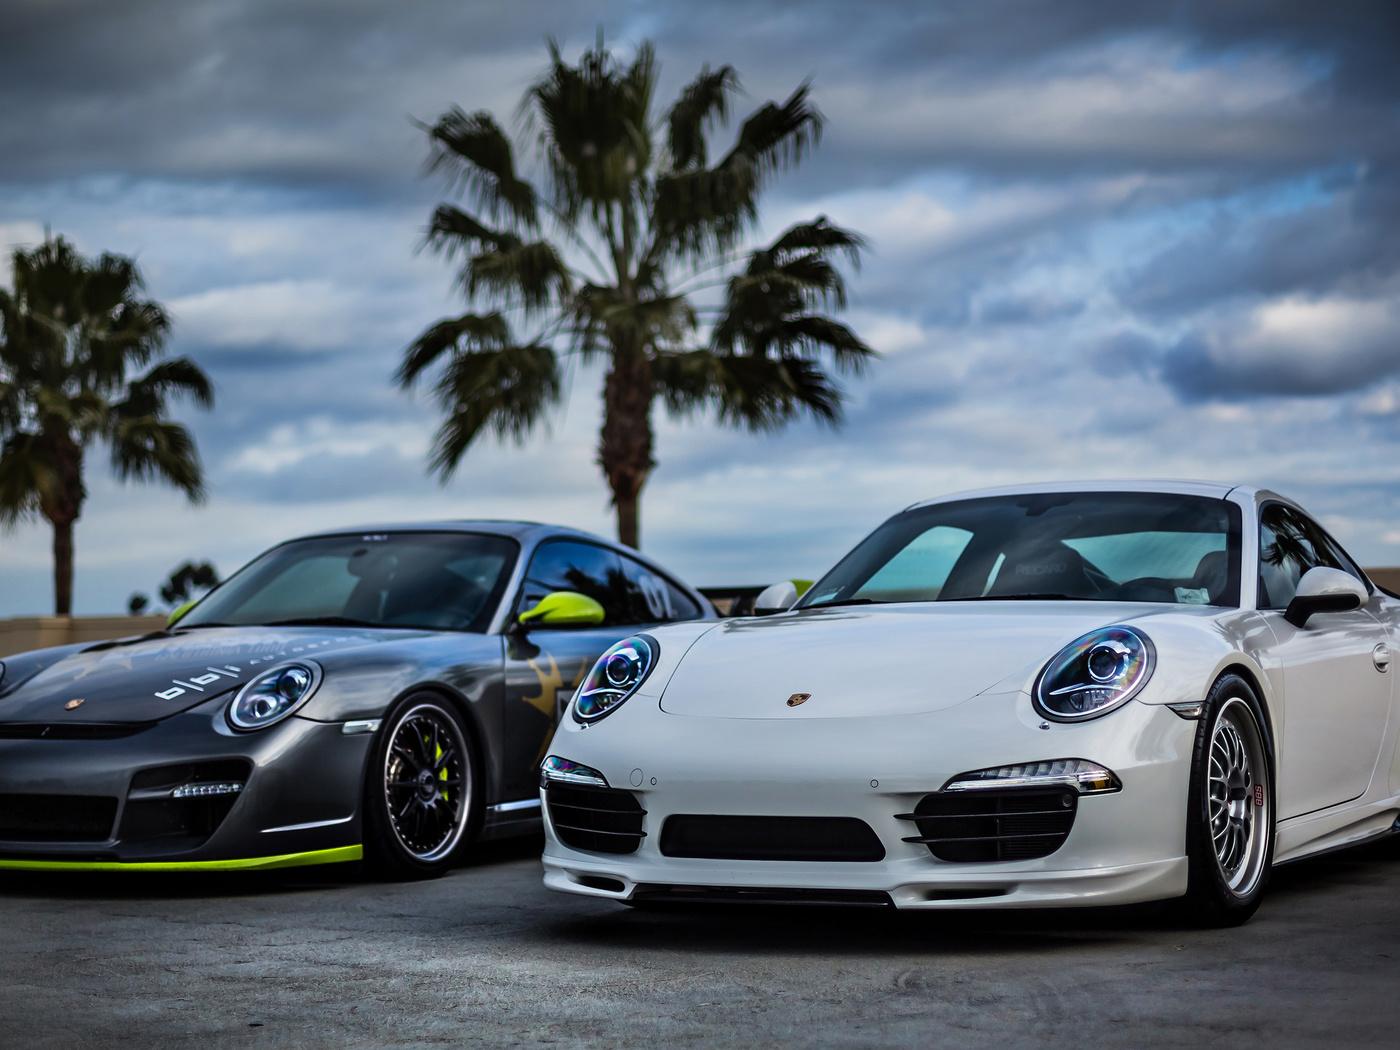 white, silver, sky, front, Porsche, palm, белый, порше, 911, небо, серебро